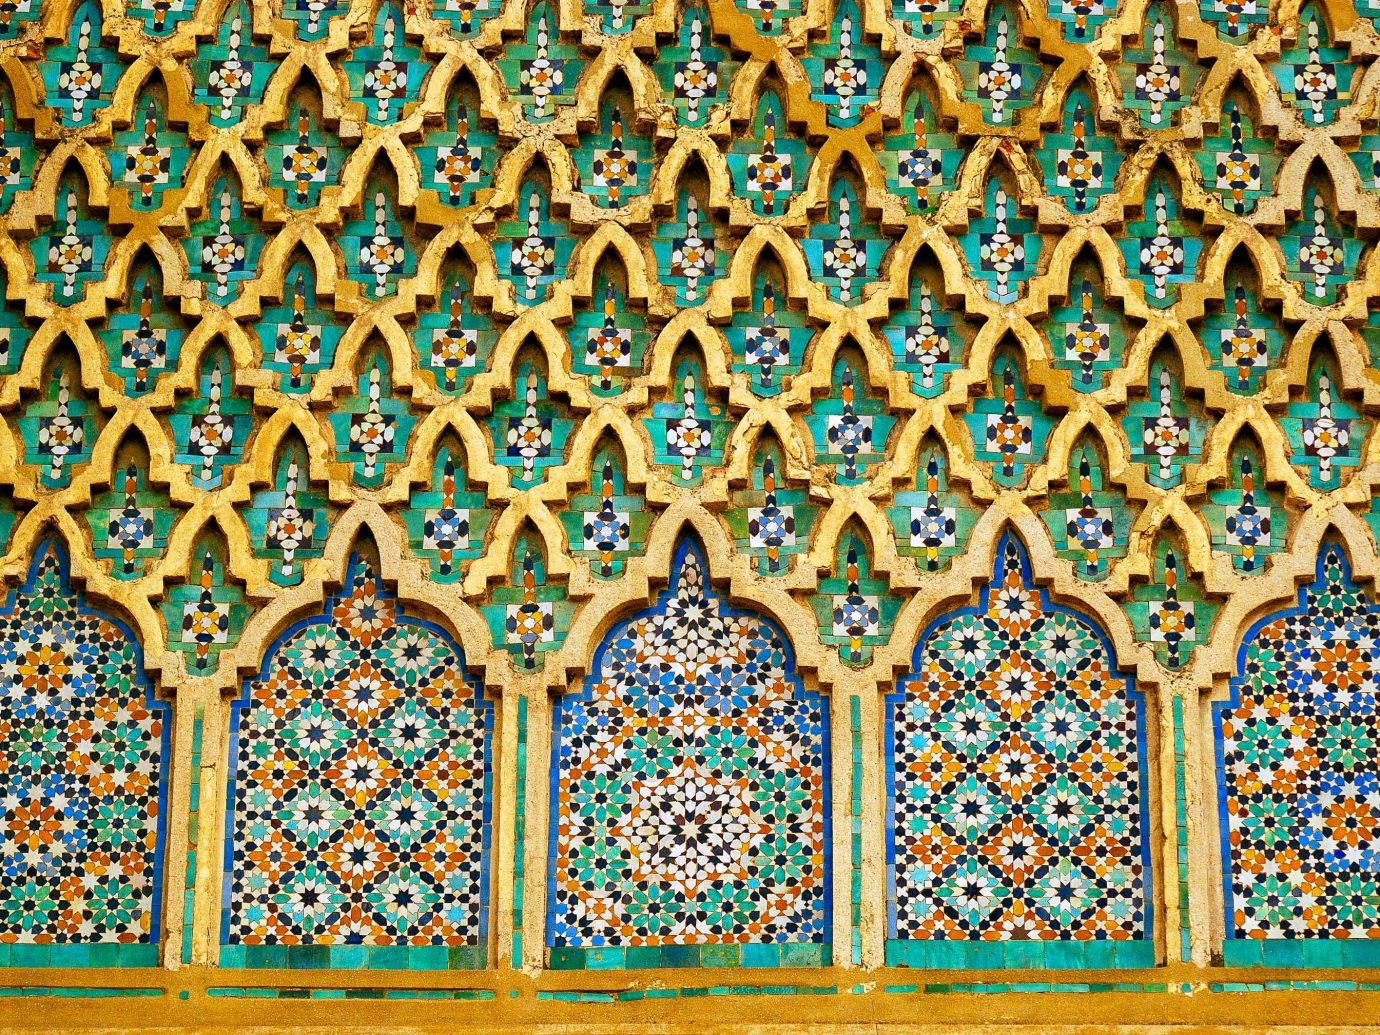 Arts + Culture Marrakech Morocco Style + Design pattern Design mosaic symmetry window art blue colorful